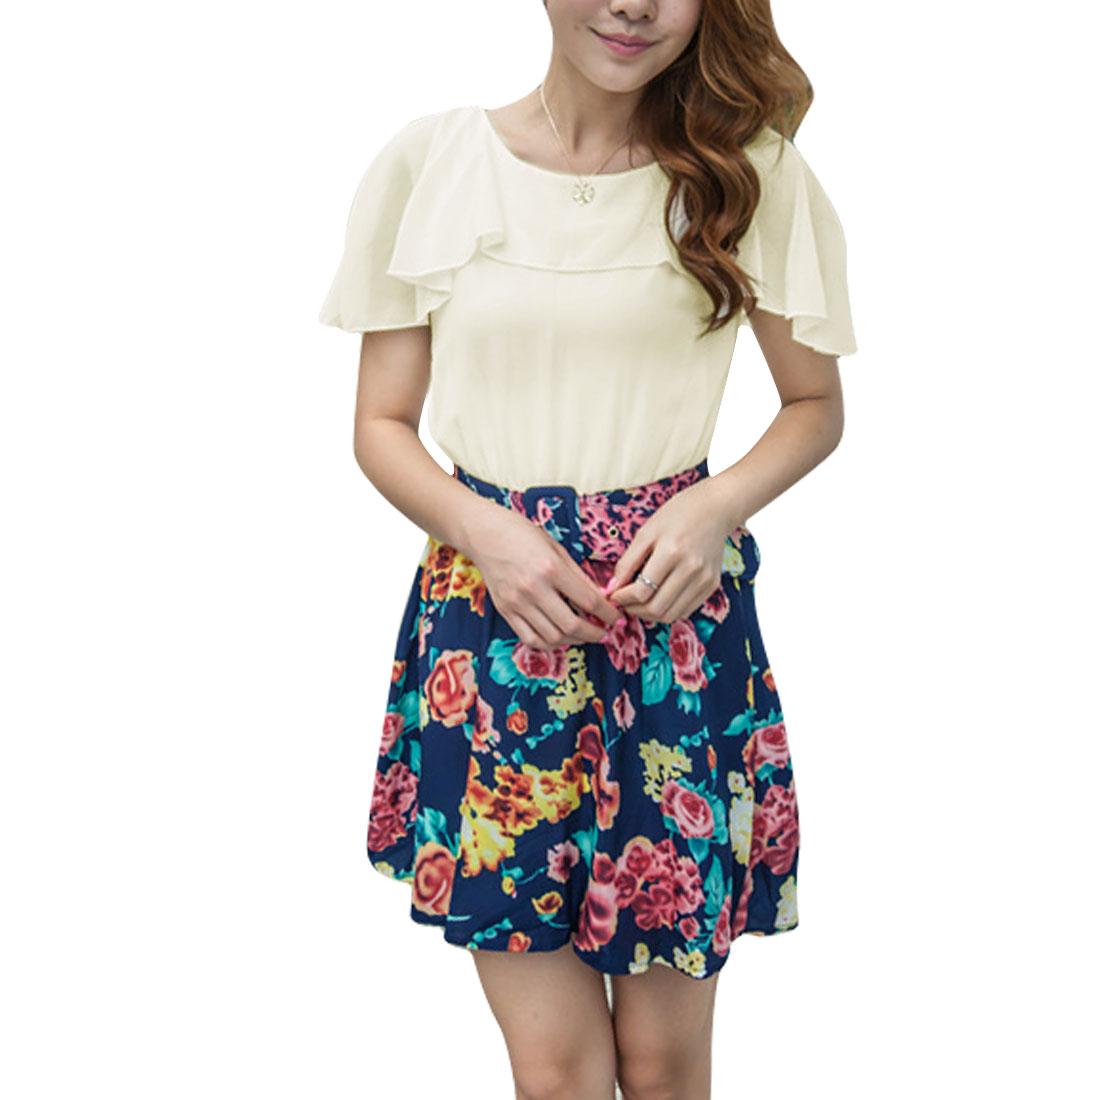 Lady Sleeveless Flower Pattern Lining Tunic Dress Off White Navy Blue XS